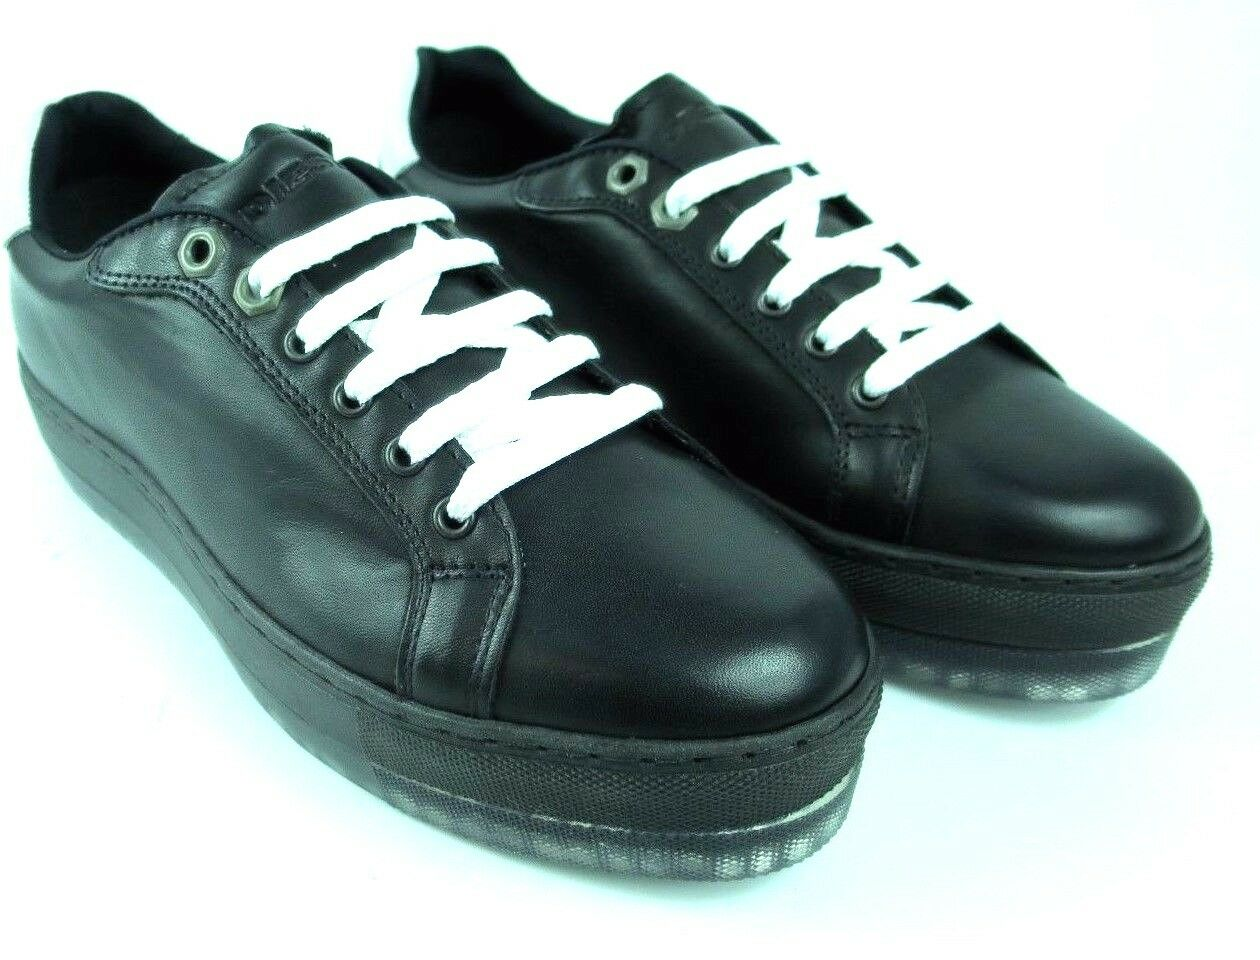 DIESEL Baskets S-andyes Femmes Baskets femmes chaussures en cuir noir y01251 neuf A